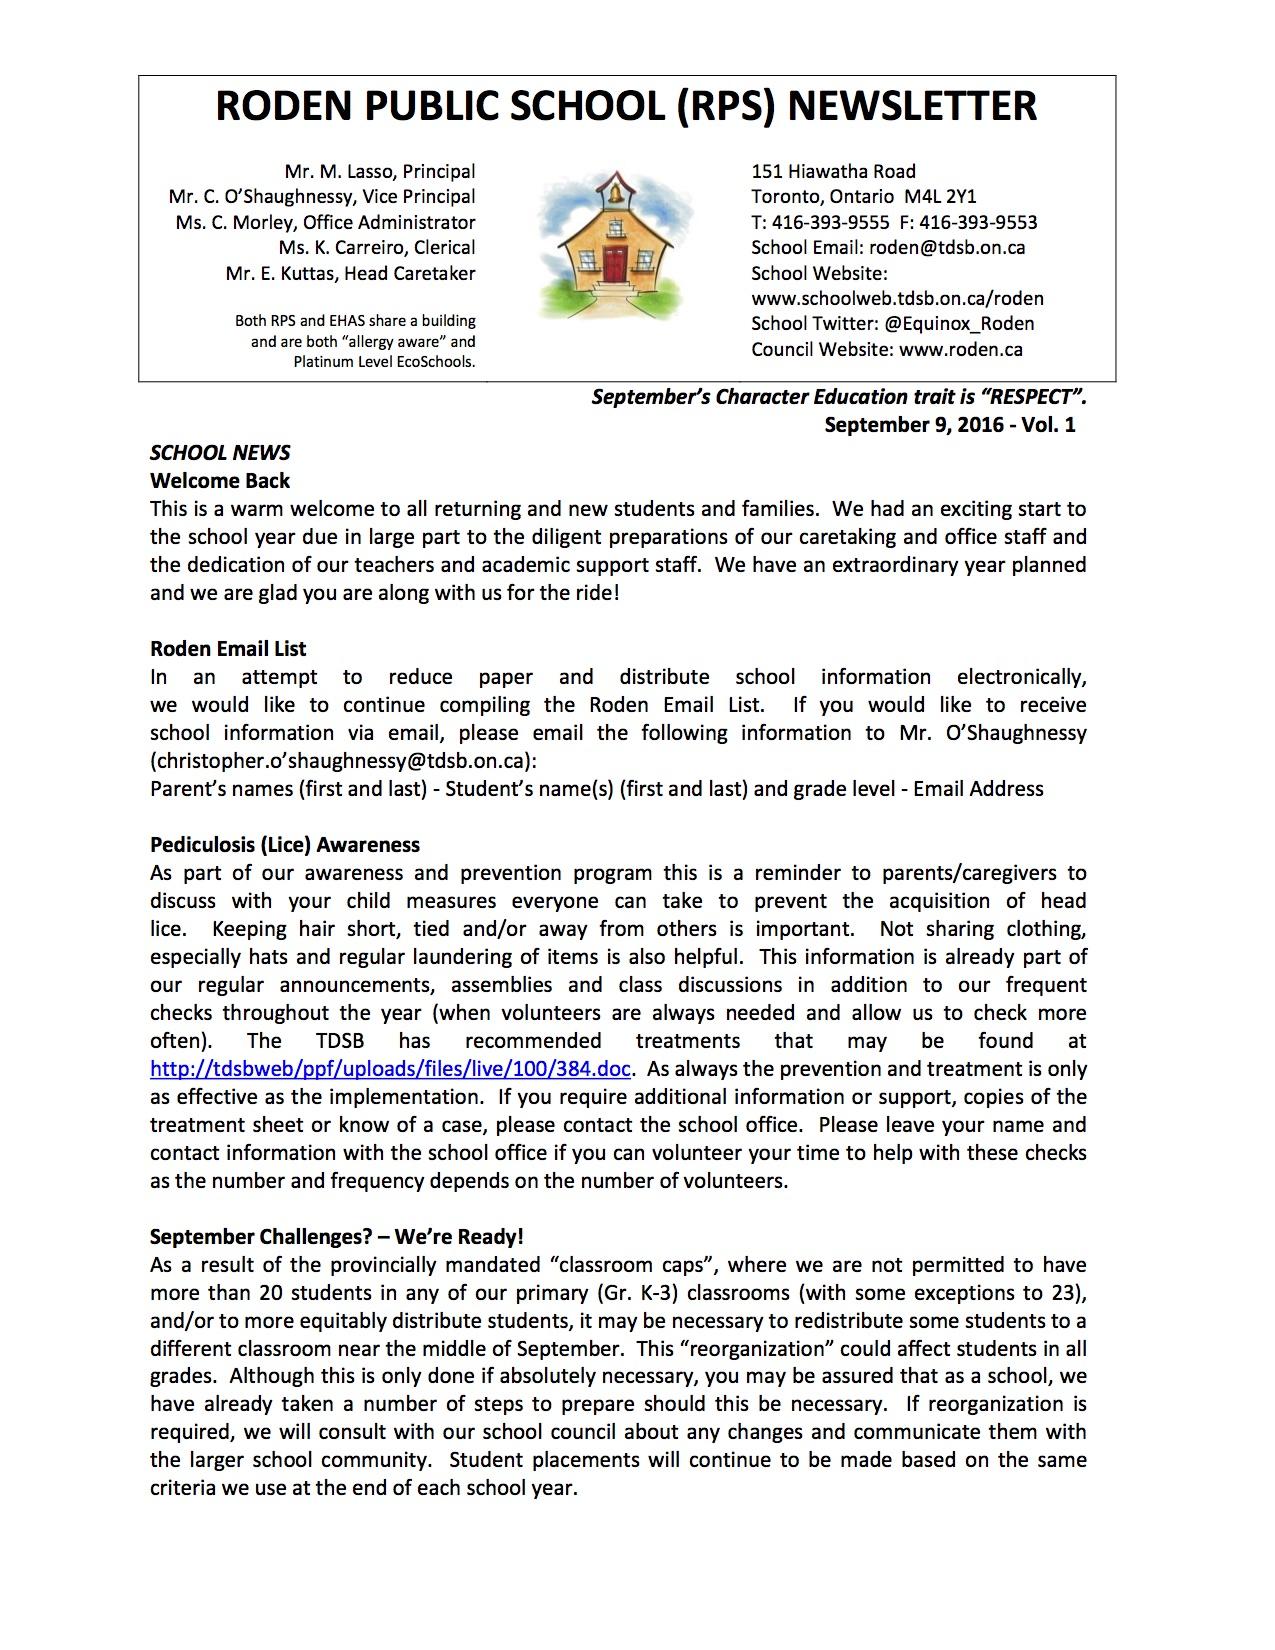 Roden Newsletter 16-09-08p1